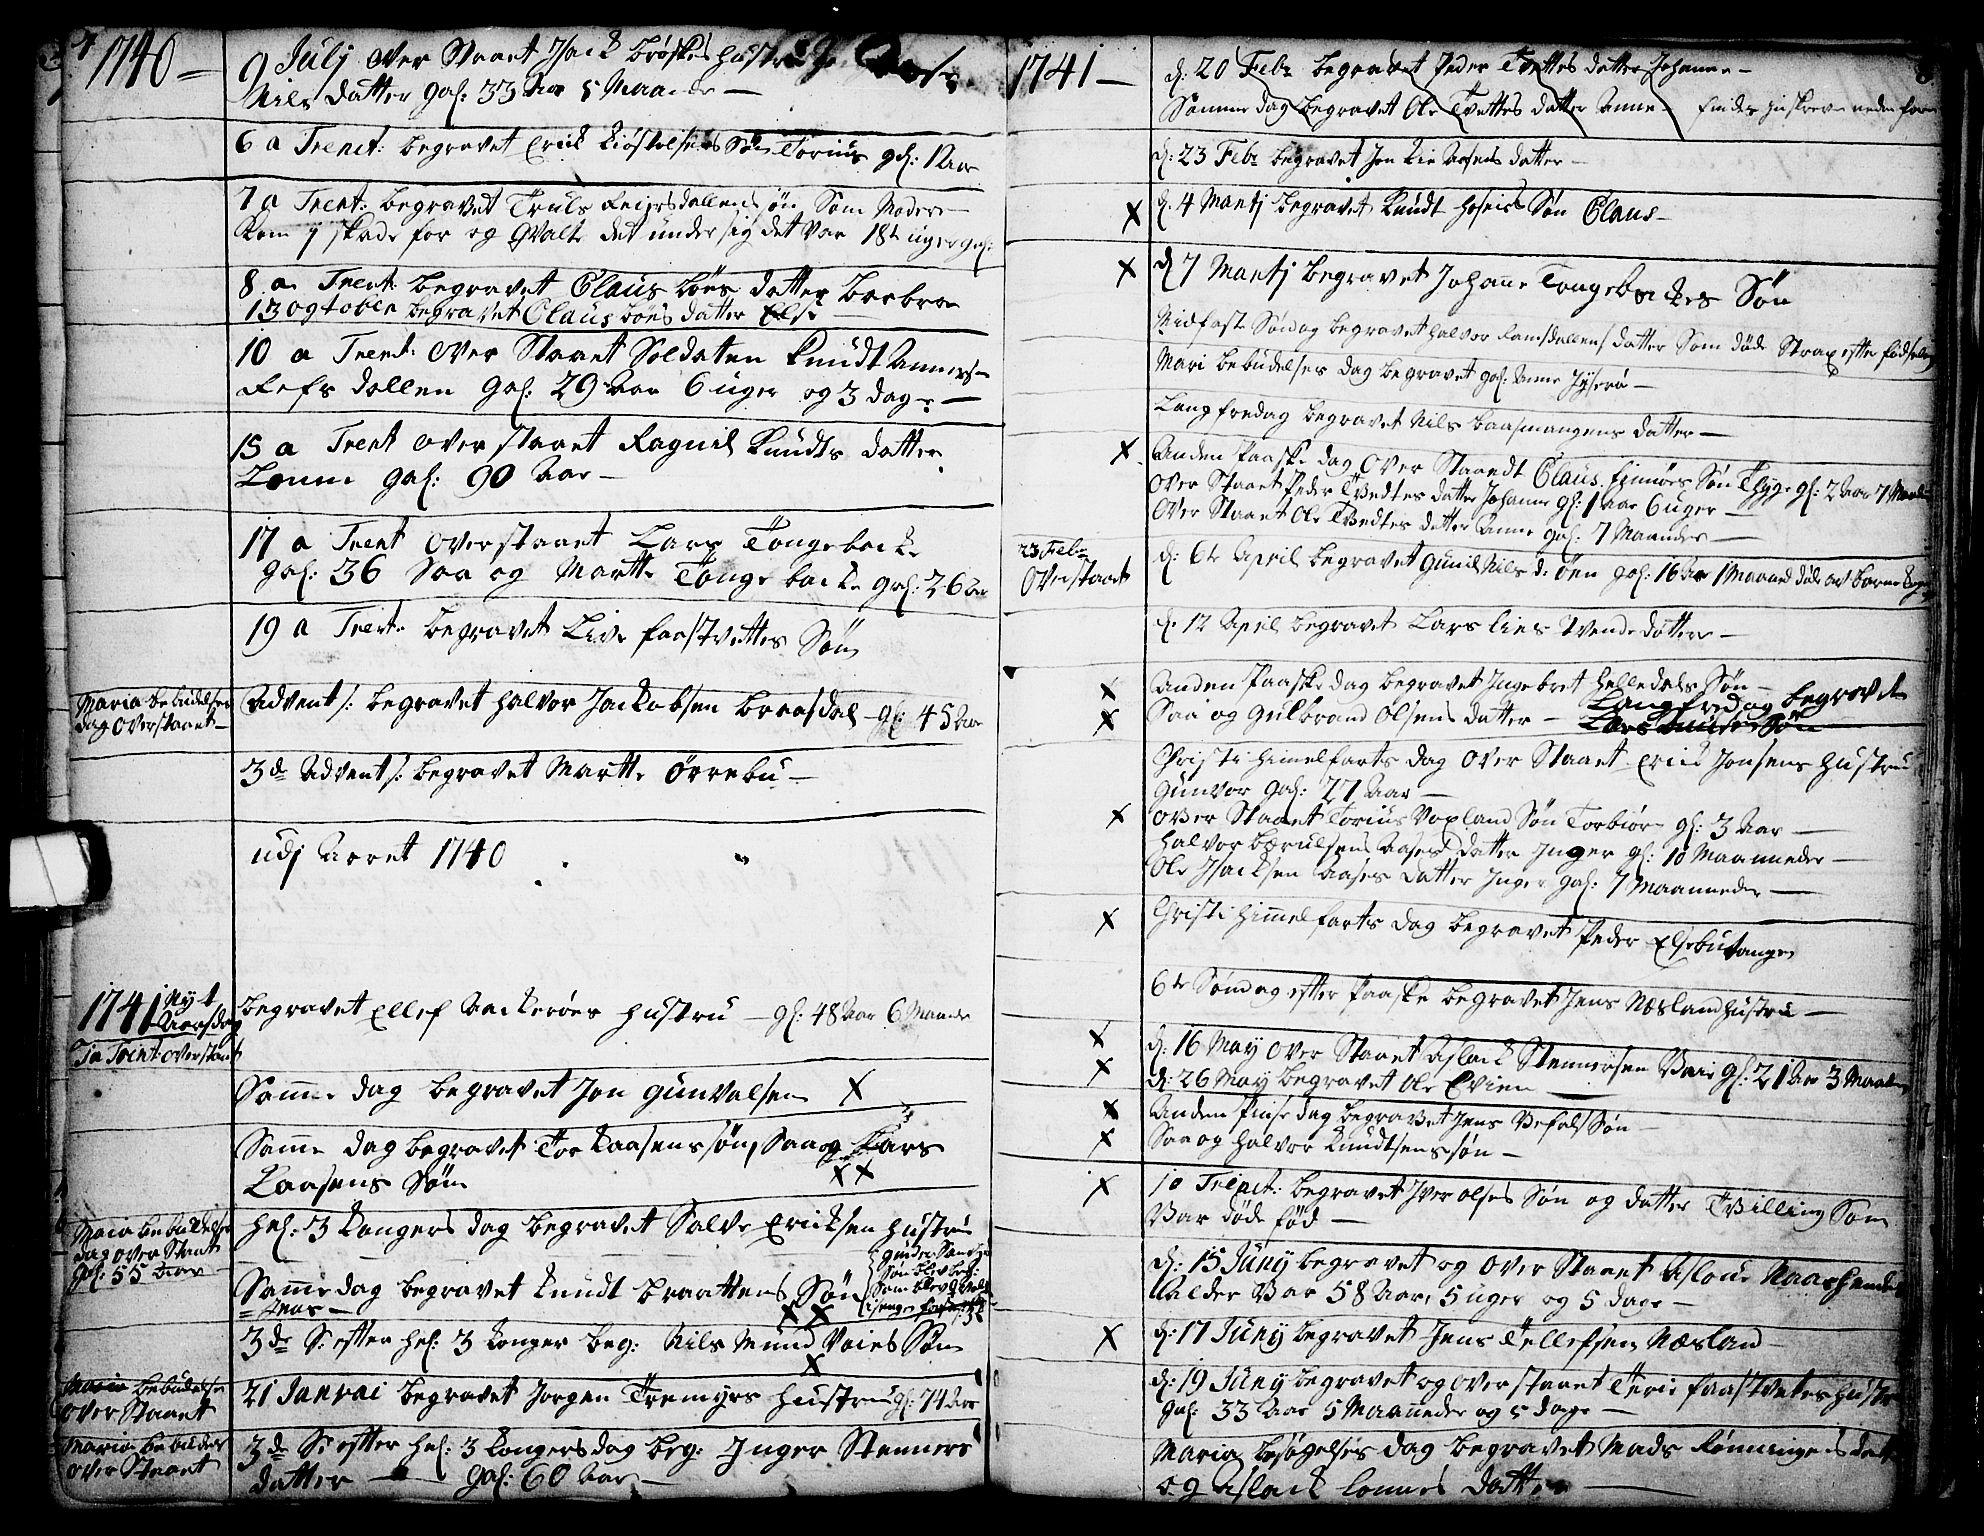 SAKO, Drangedal kirkebøker, F/Fa/L0002: Ministerialbok nr. 2, 1733-1753, s. 7-8